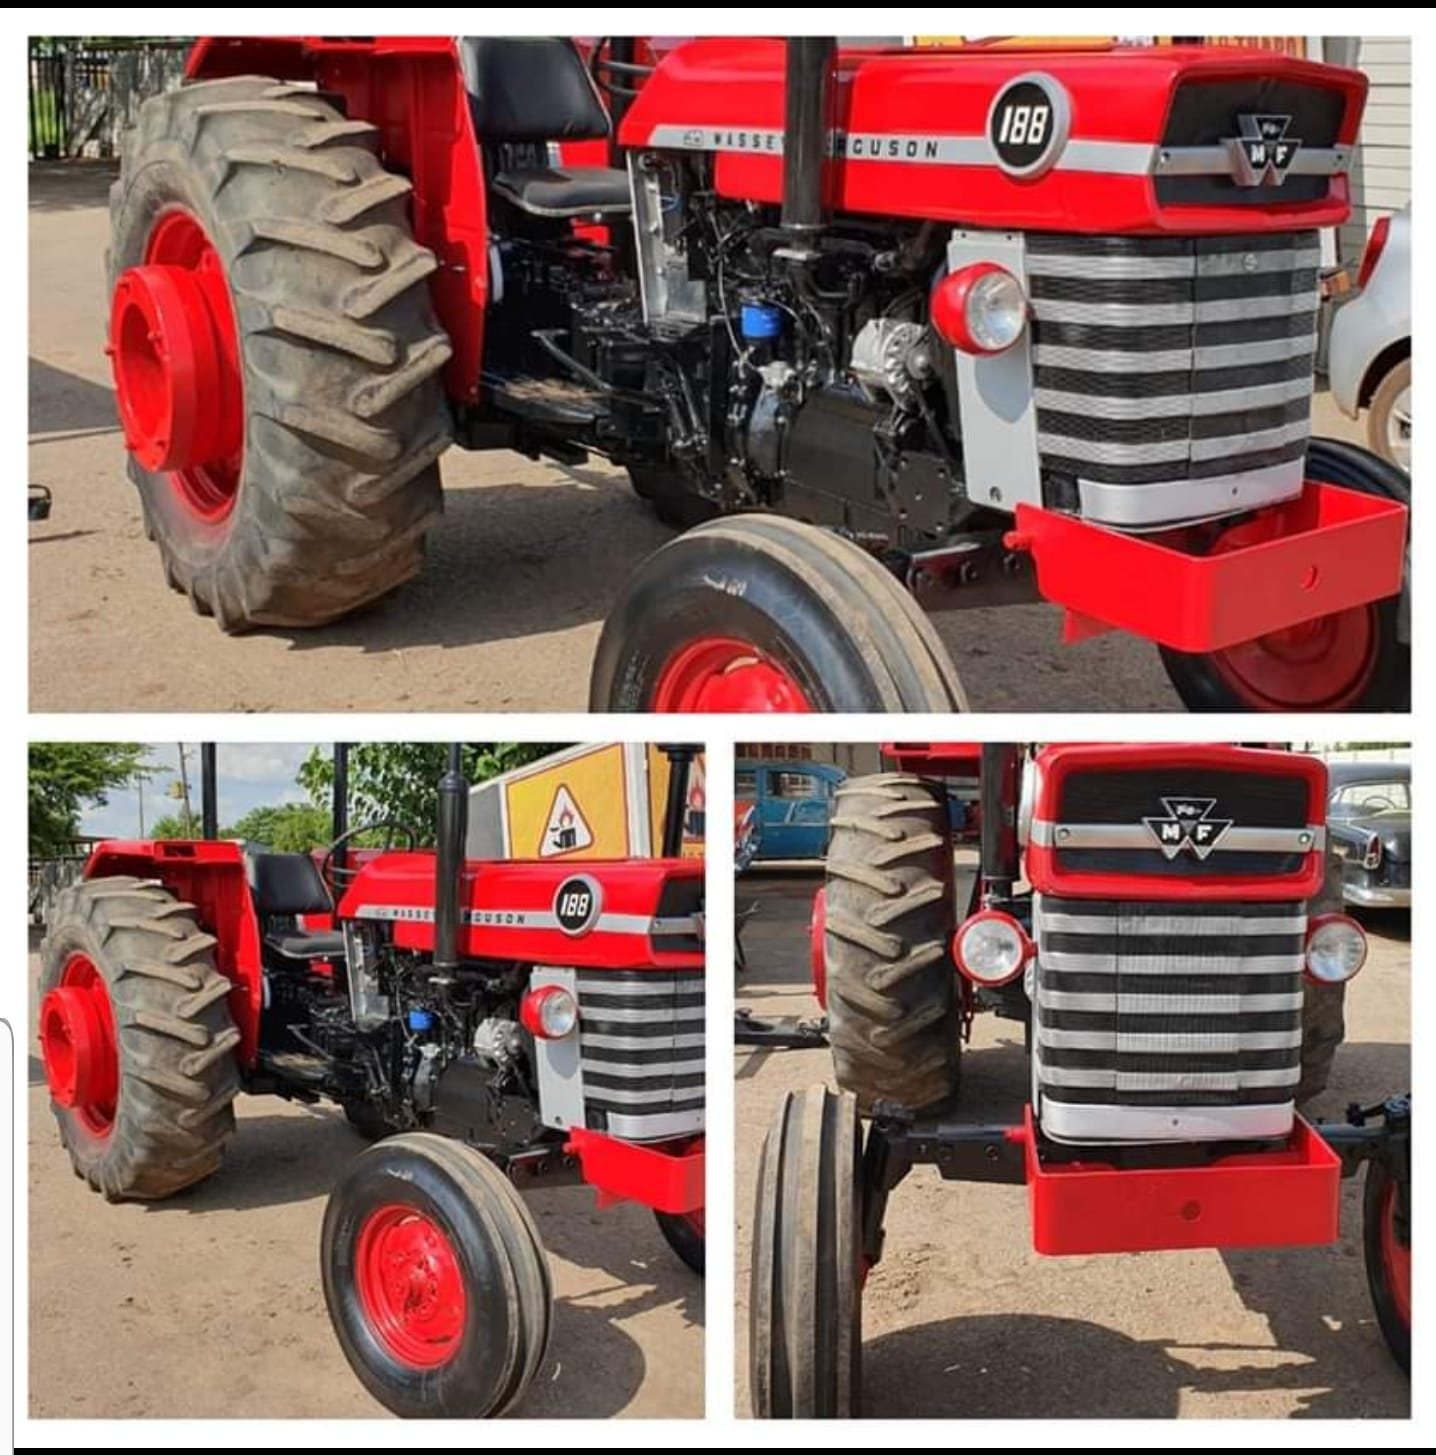 Massey Ferguson 188 2wd tractor